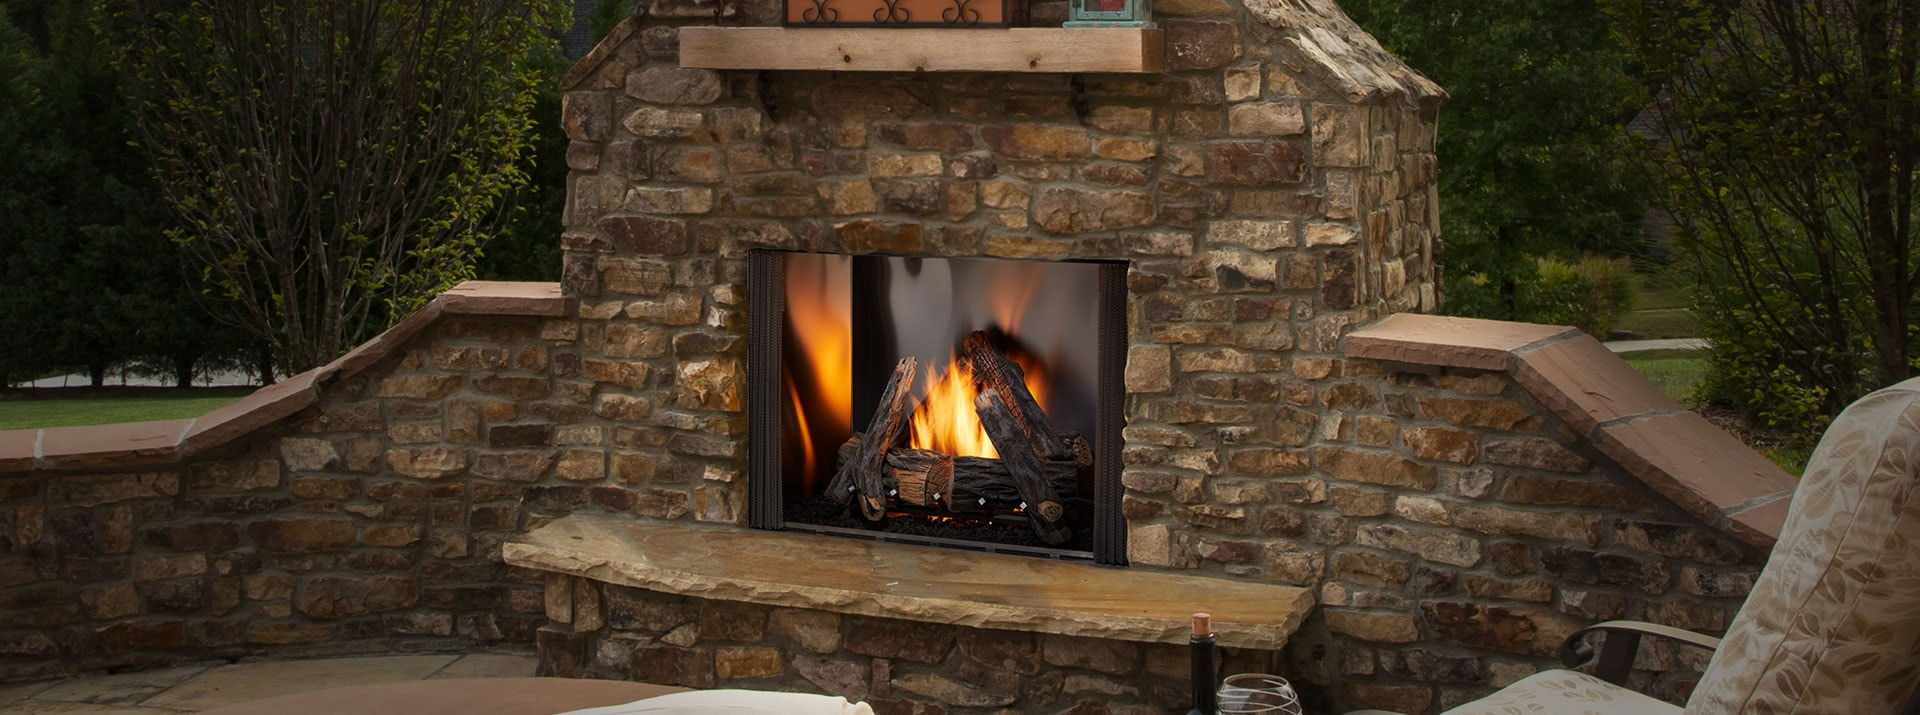 Courtyard Gas Outdoor Fireplace Monessen Hearth